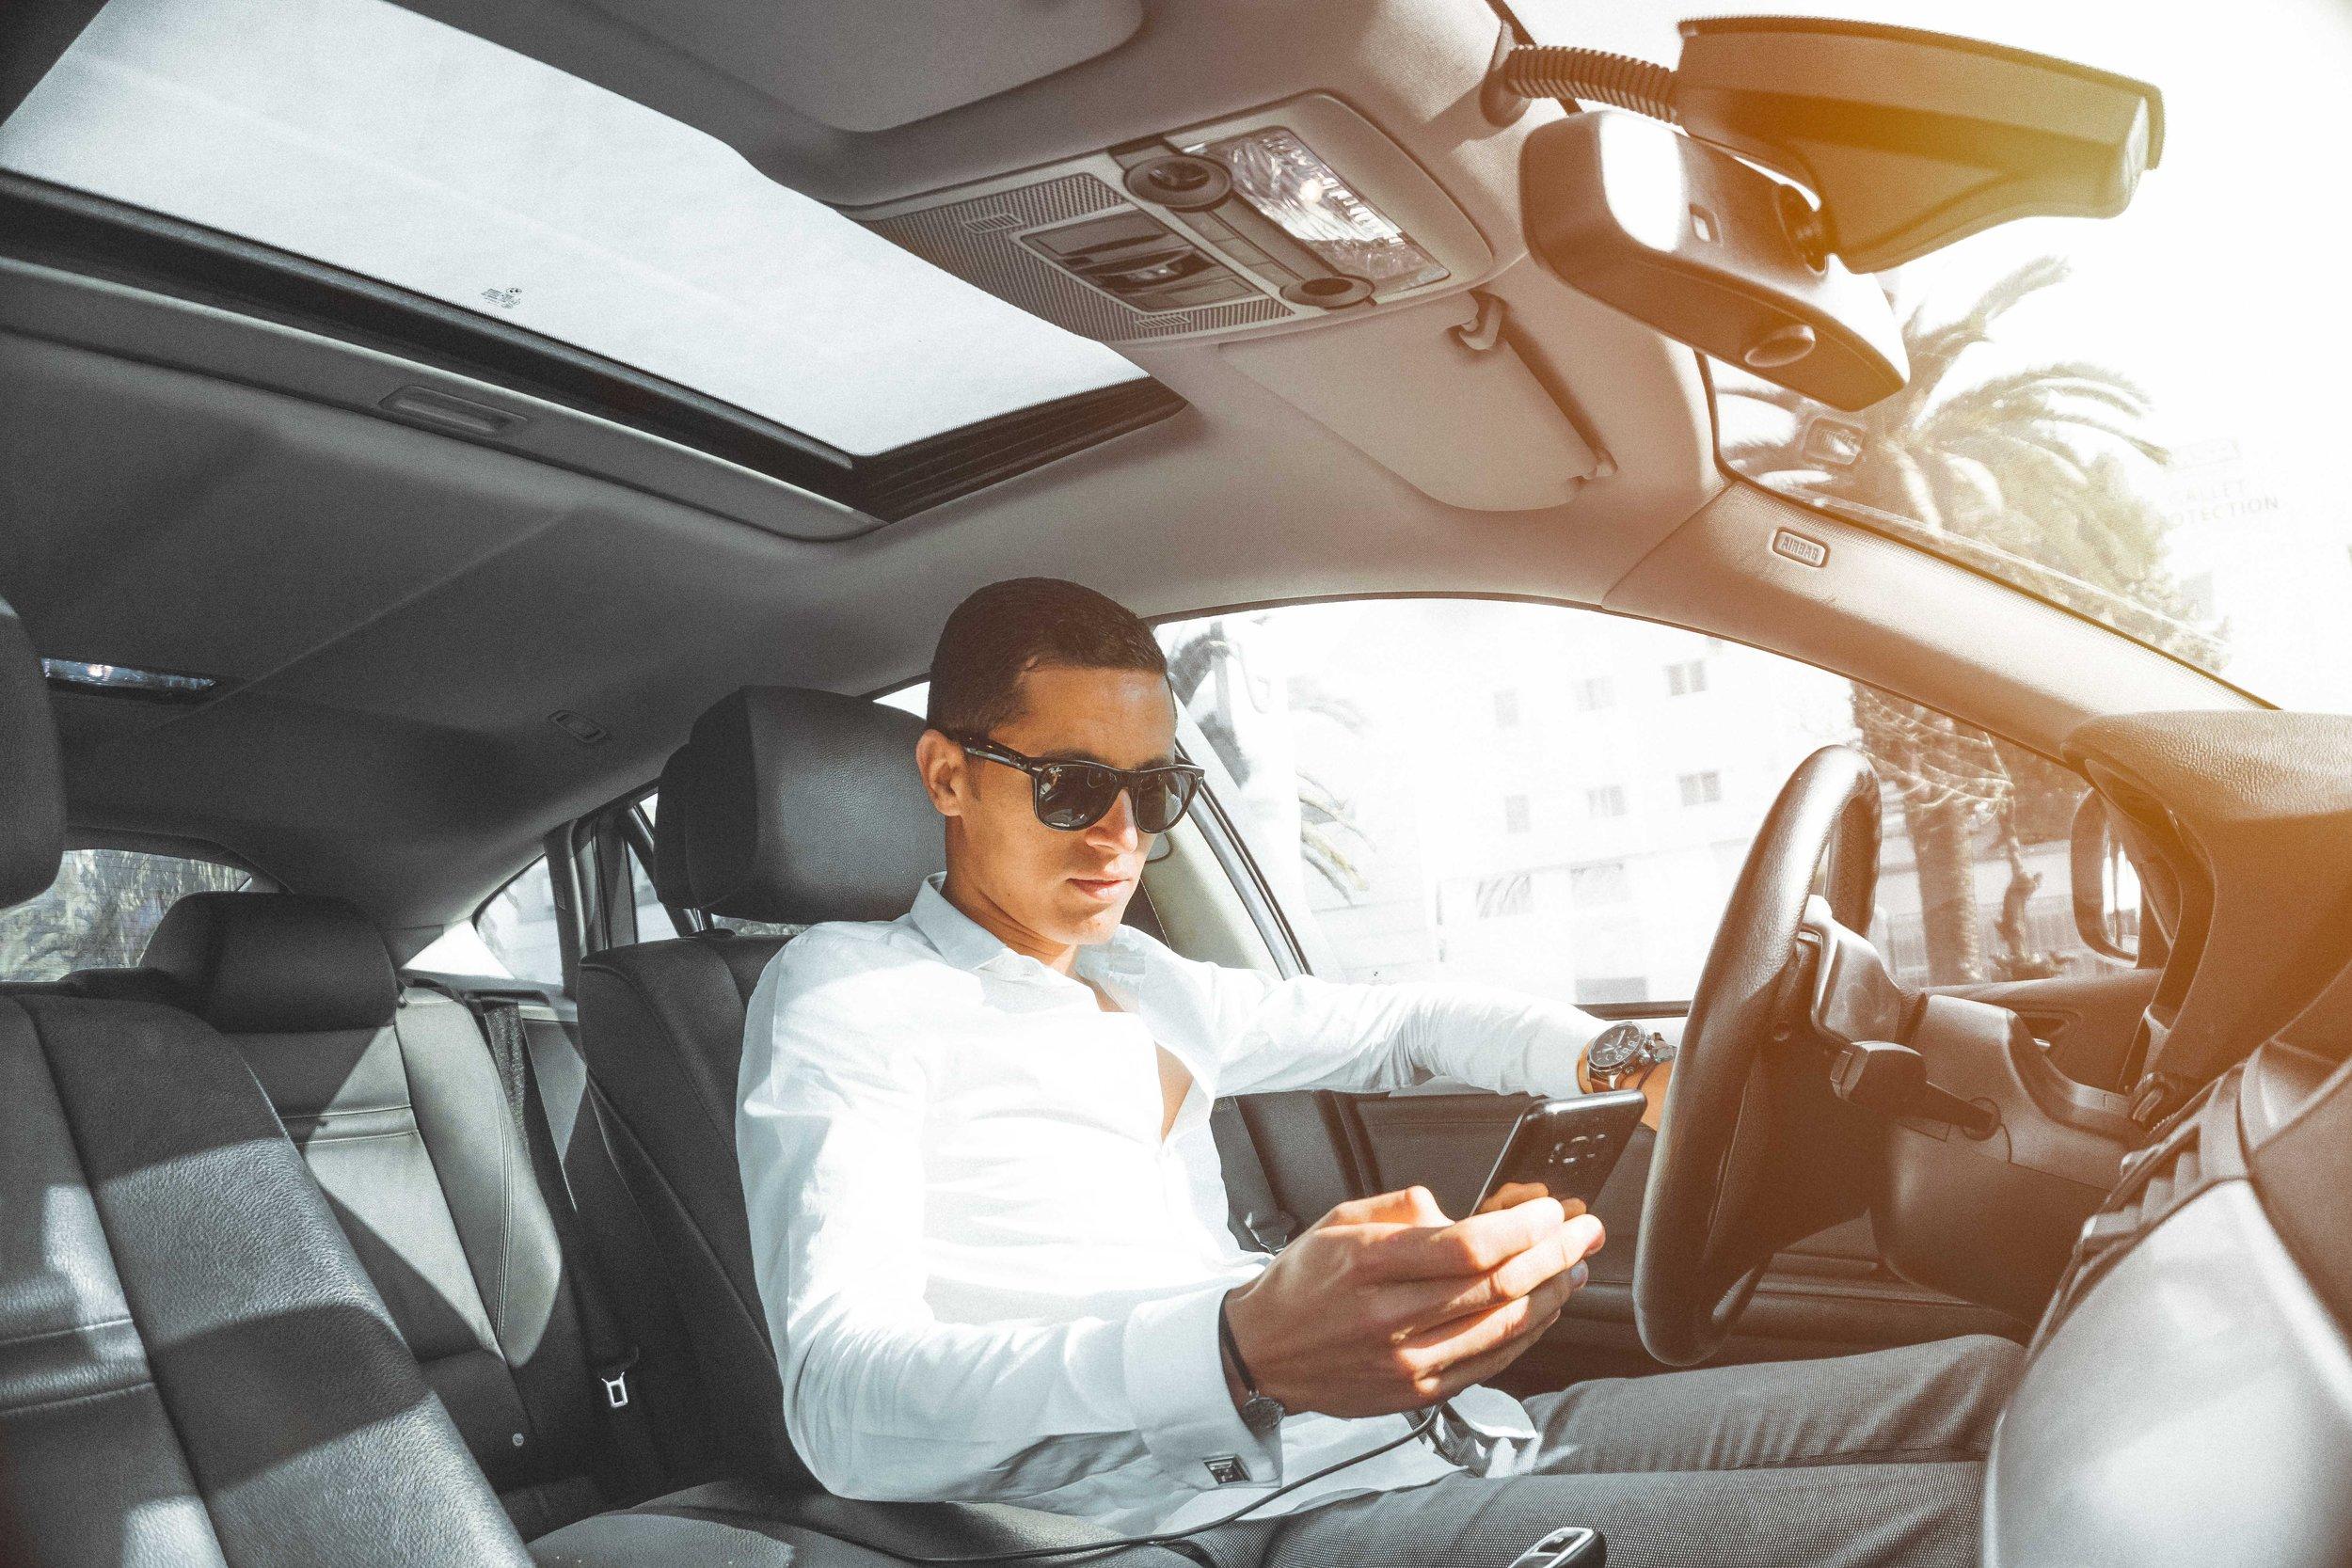 car-car-interior-cellphone-804128.jpg